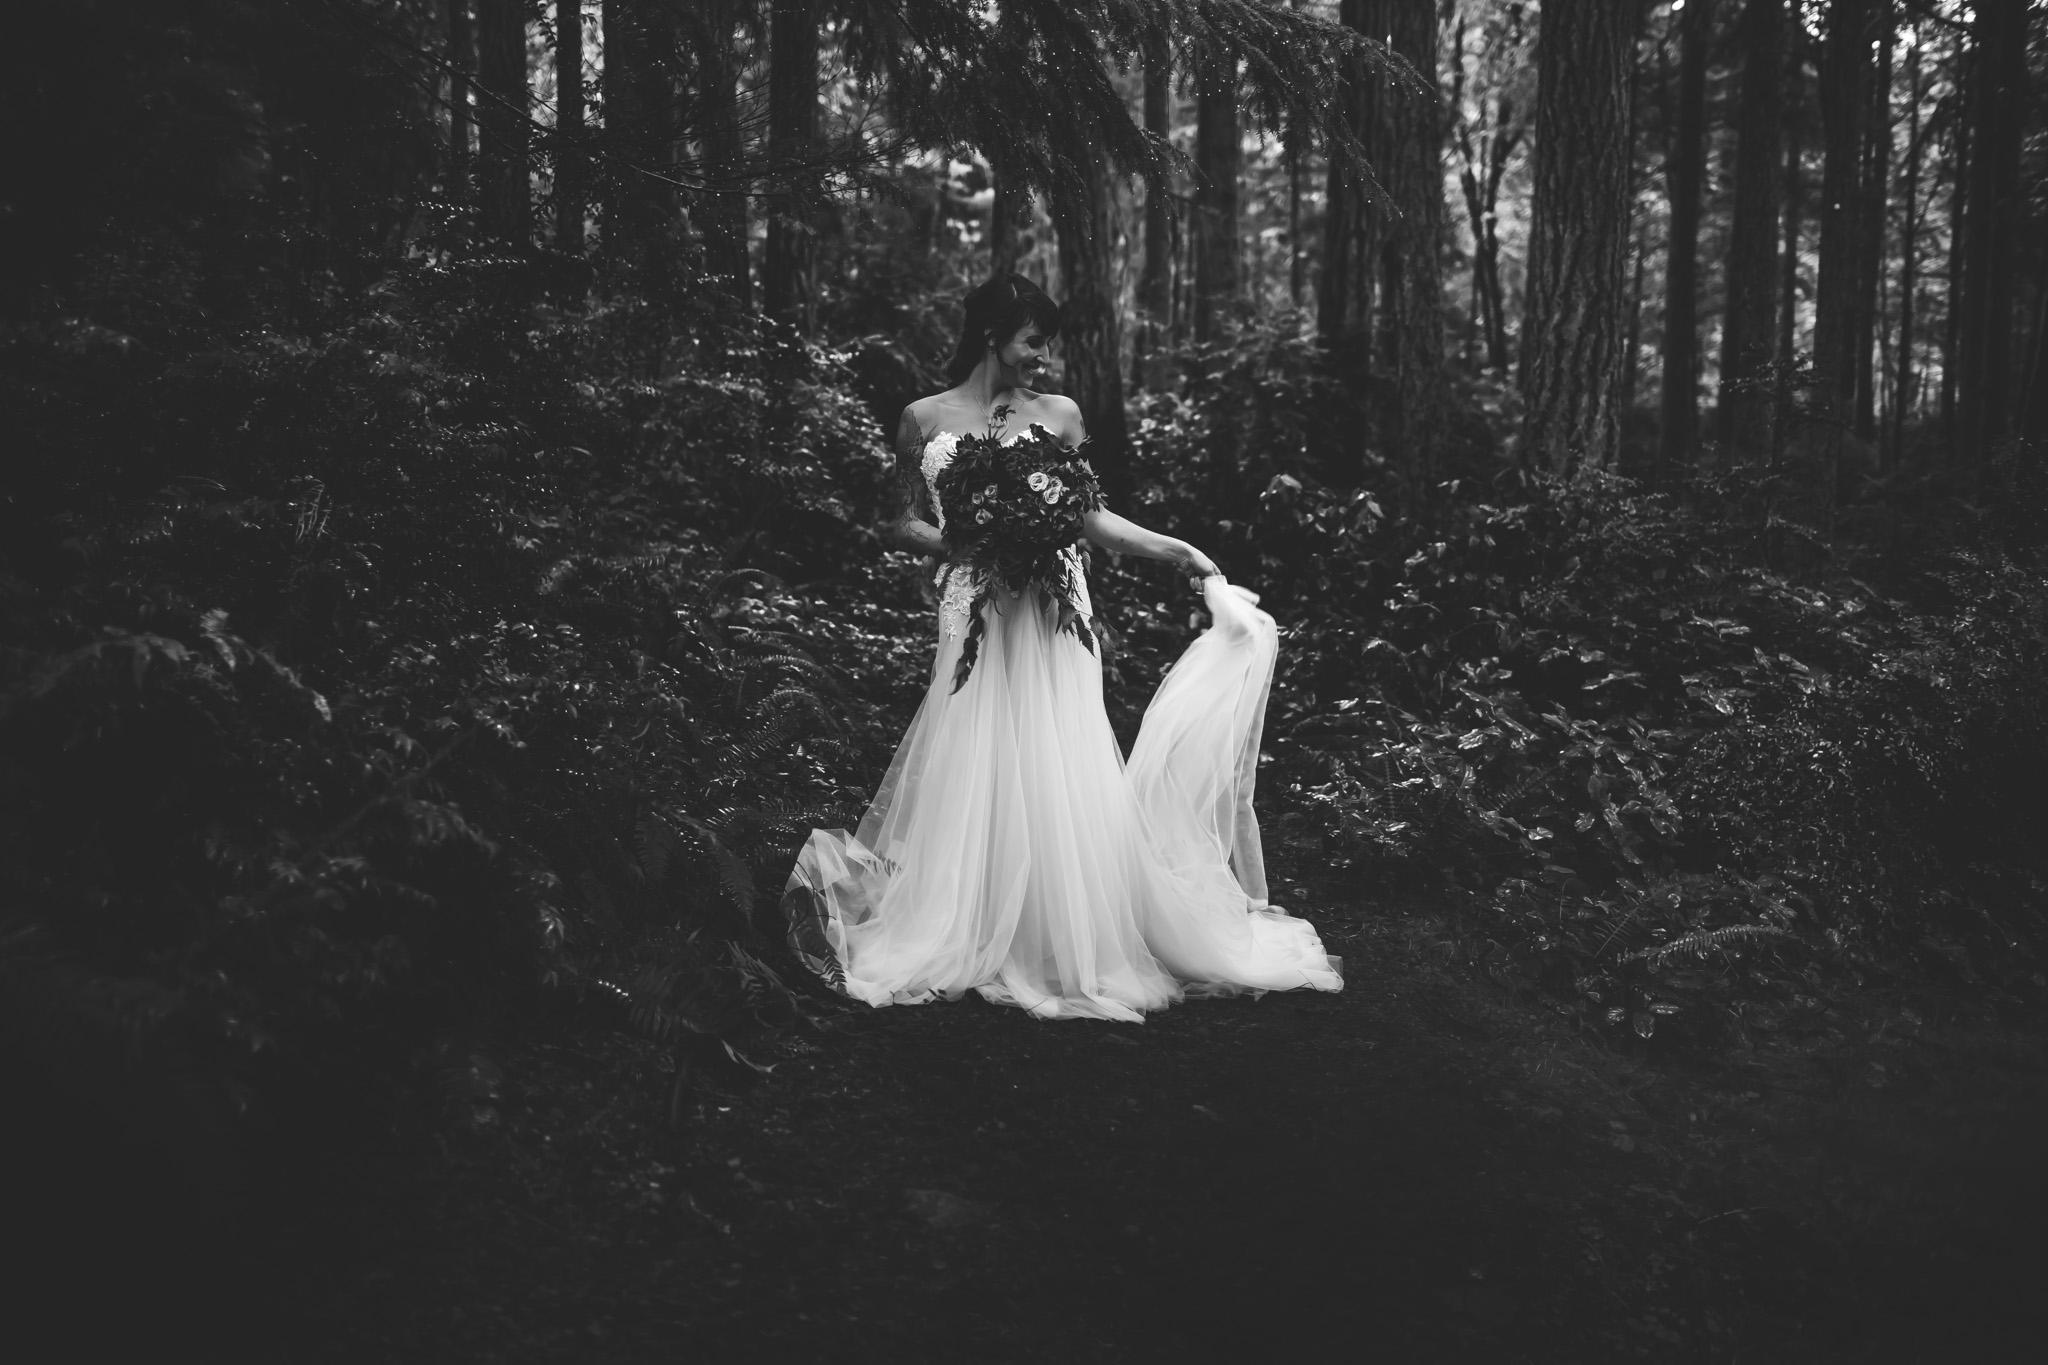 DannieMelissaWit_AbeillePhotography.com_BARE_Bridal_COLLABORATION-60.jpg